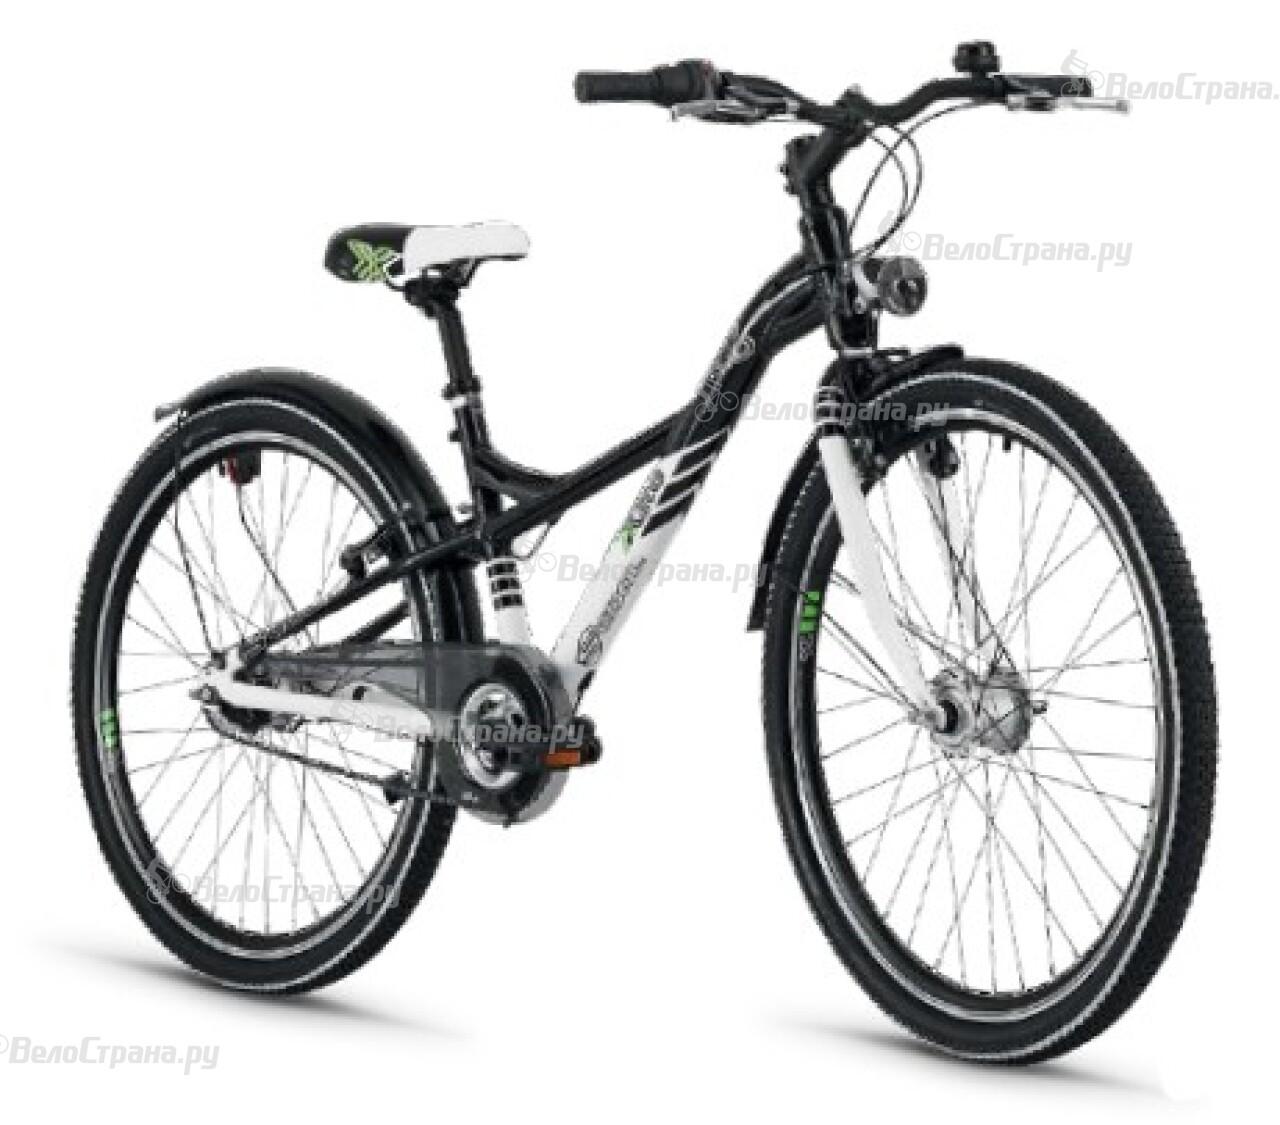 Велосипед Scool XX lite 26 7S (2014) цена